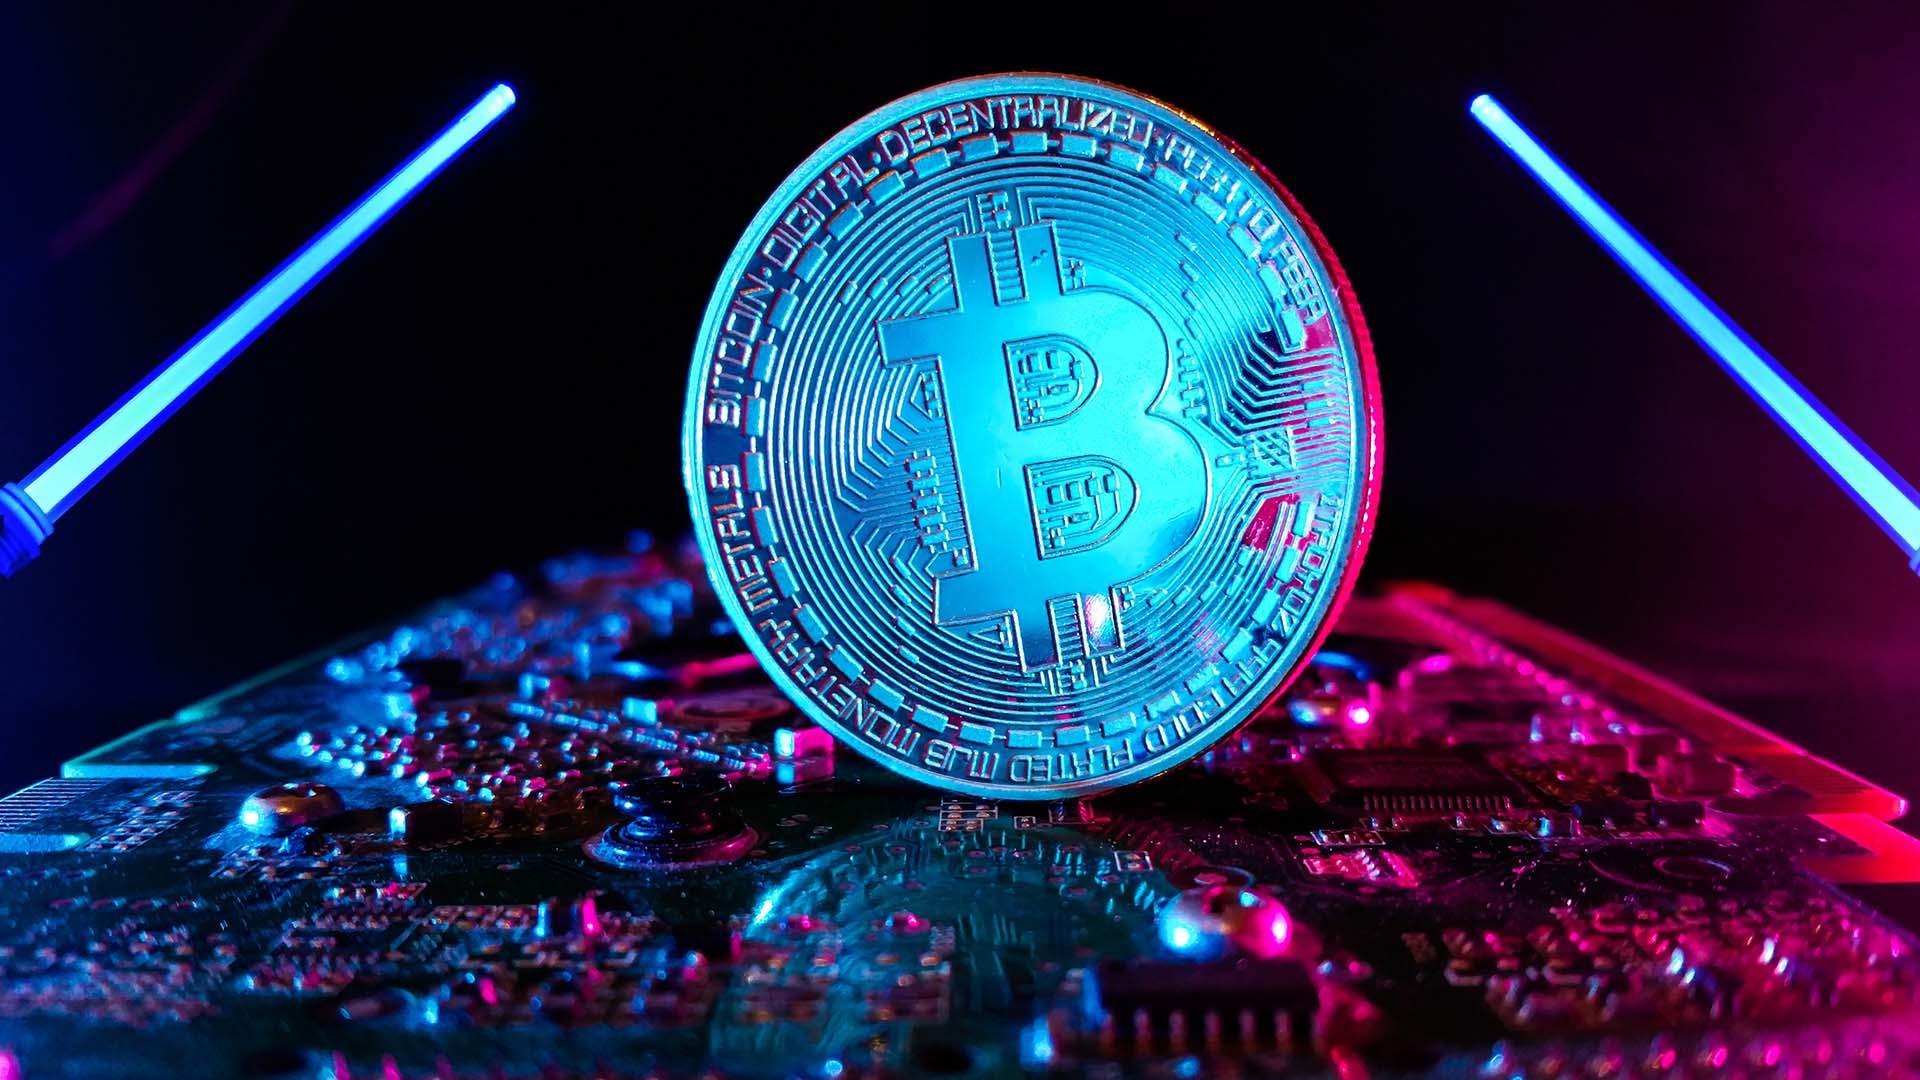 Bitcoin Hd   1920x1080 Wallpaper   teahubio 1920x1080